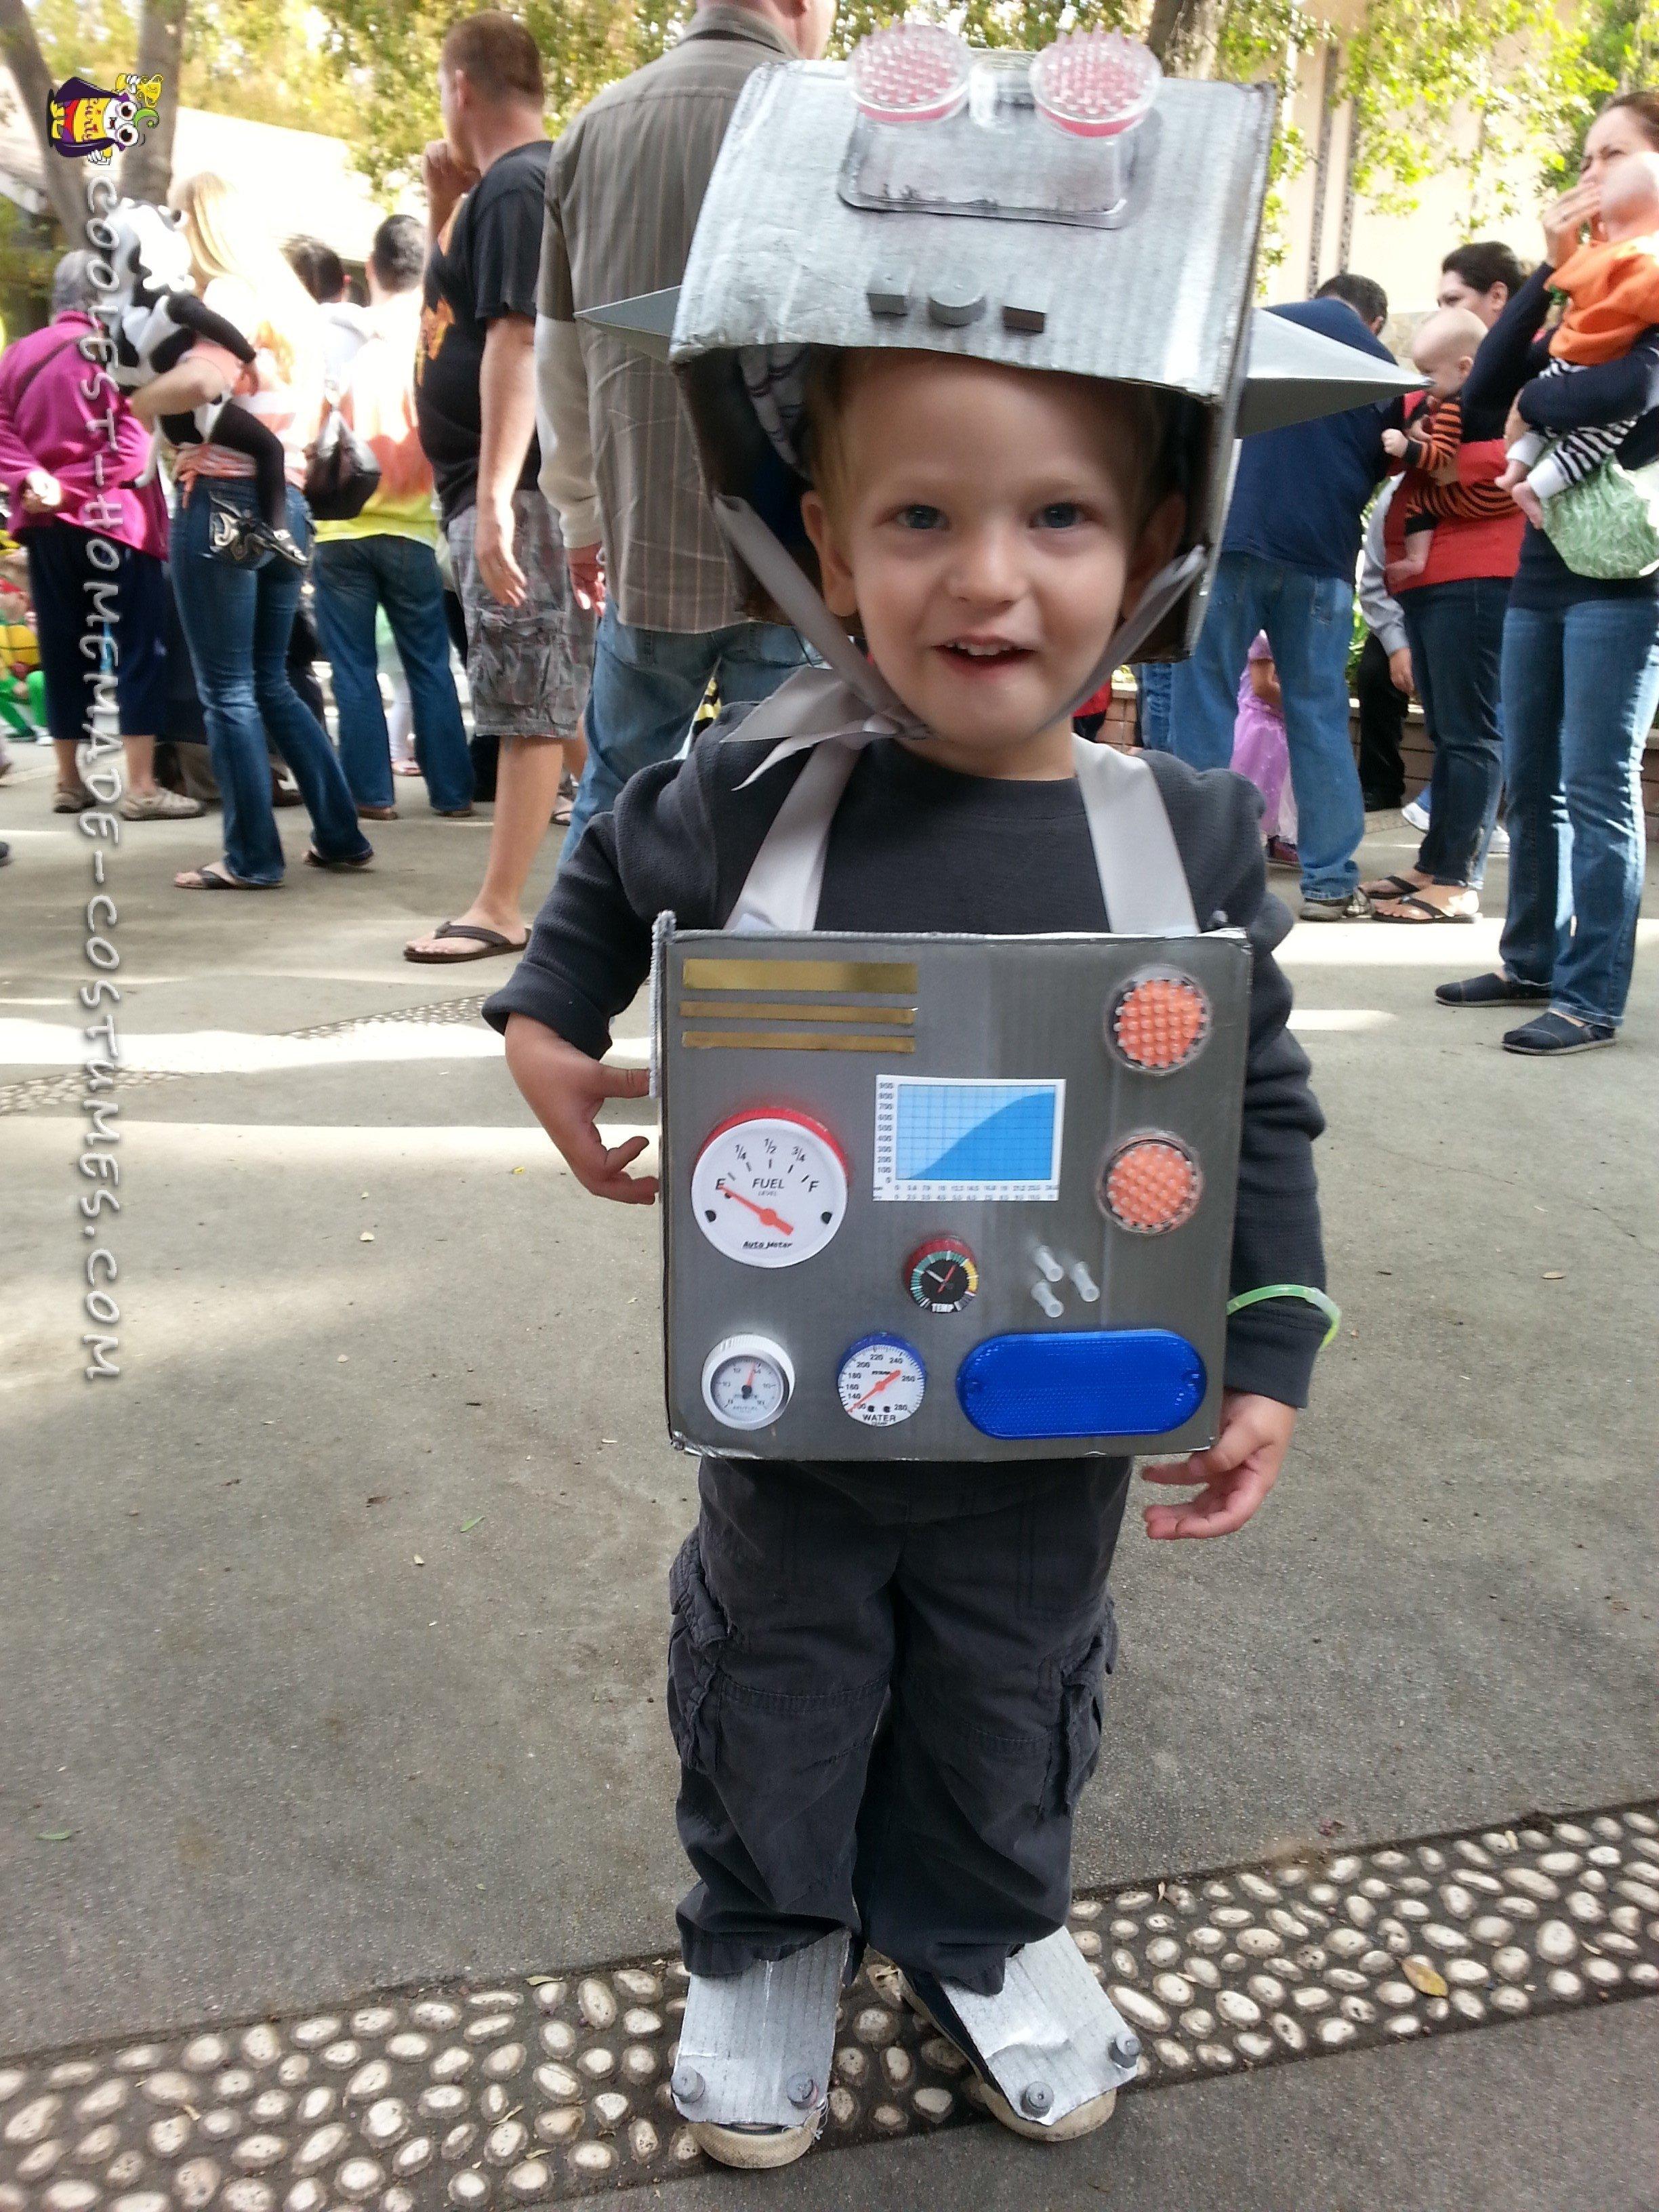 10 Stylish Homemade Costume Ideas For Boys l bot robot costume for toddler boy robot costumes homemade 2020